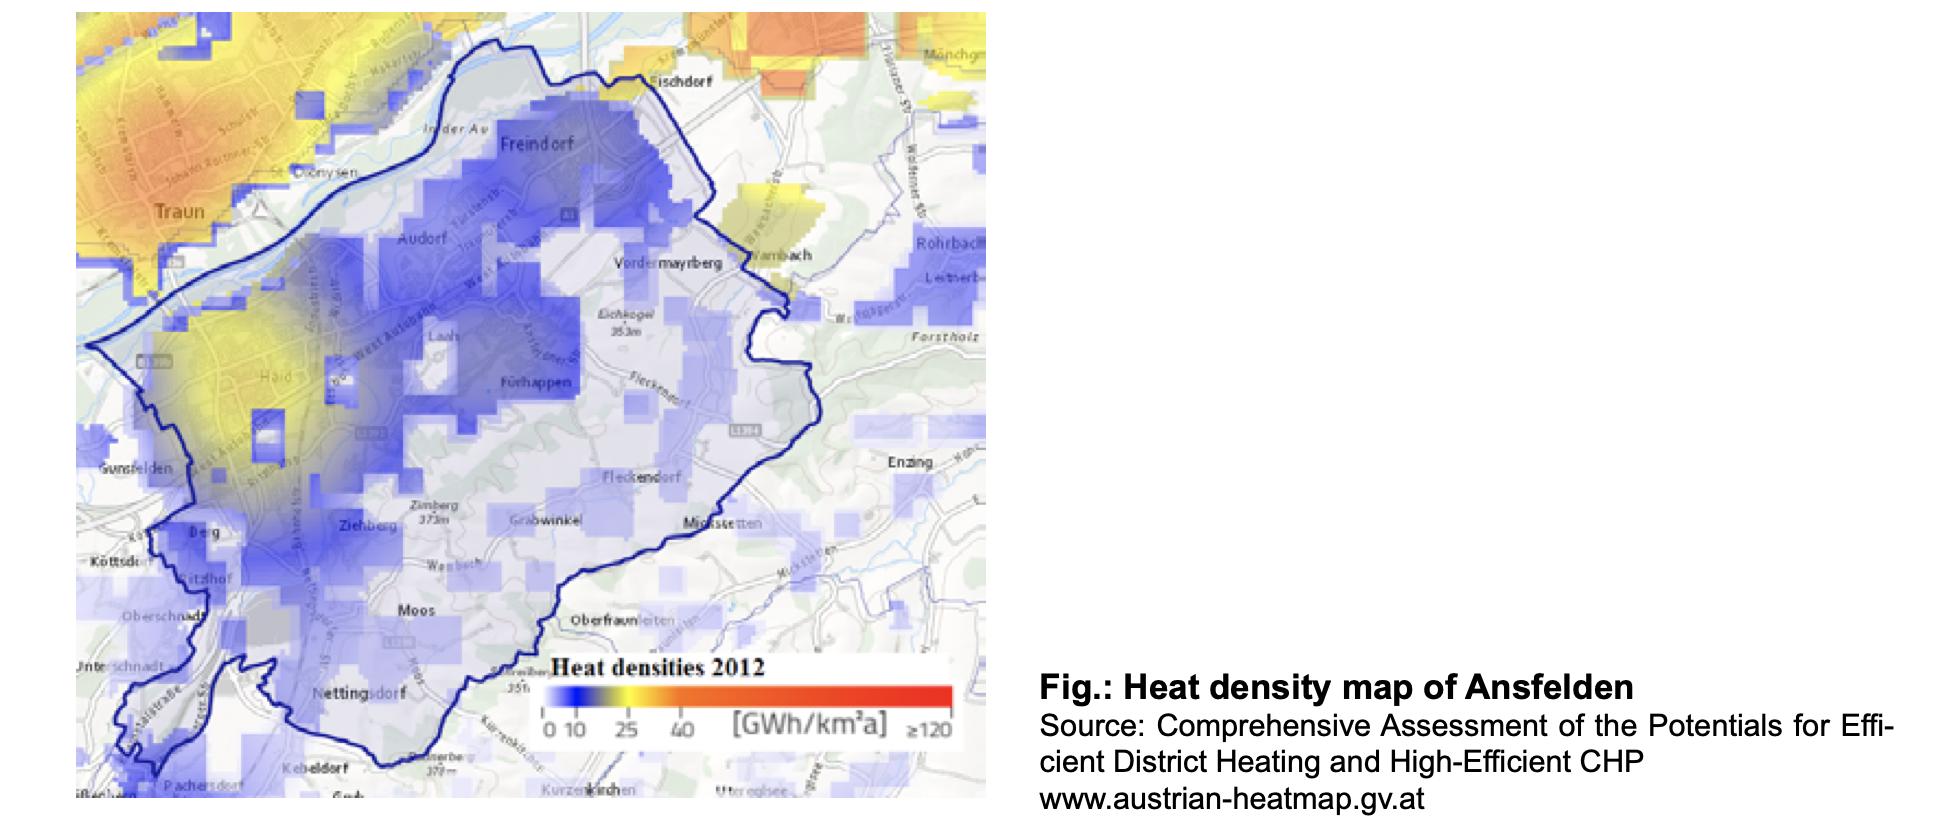 Heat density map of Ansfelden